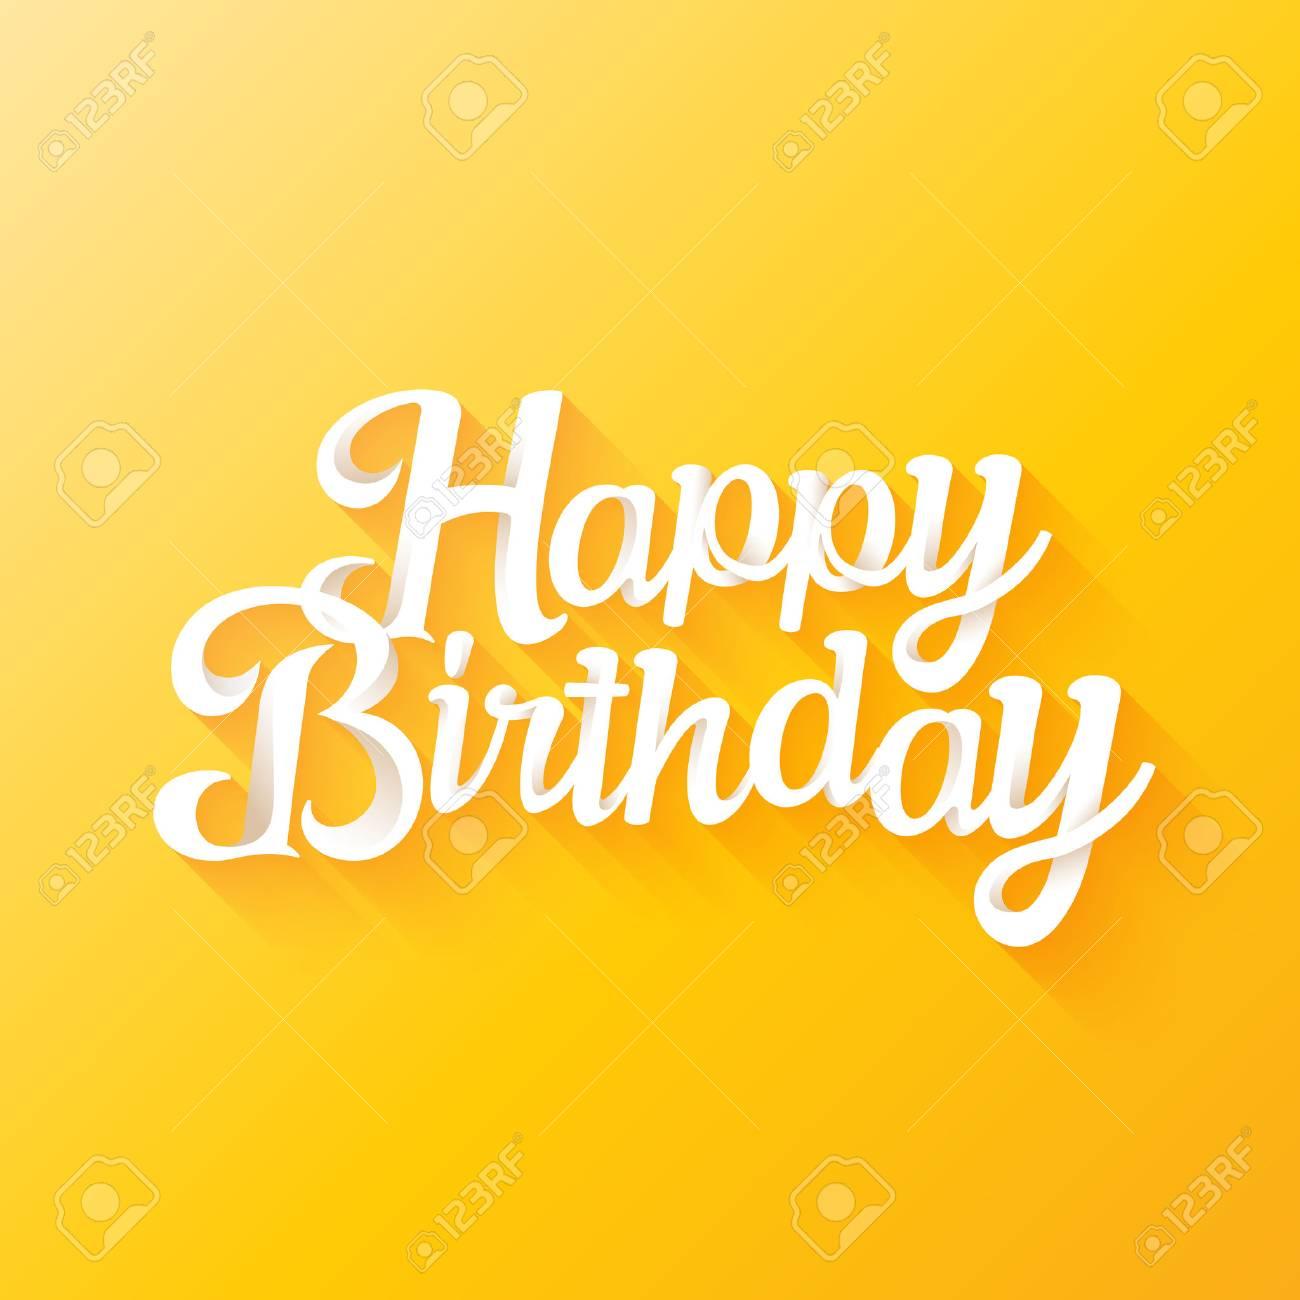 Happy Birthday beautiful 3d lettering design Stock Photo - 76533988